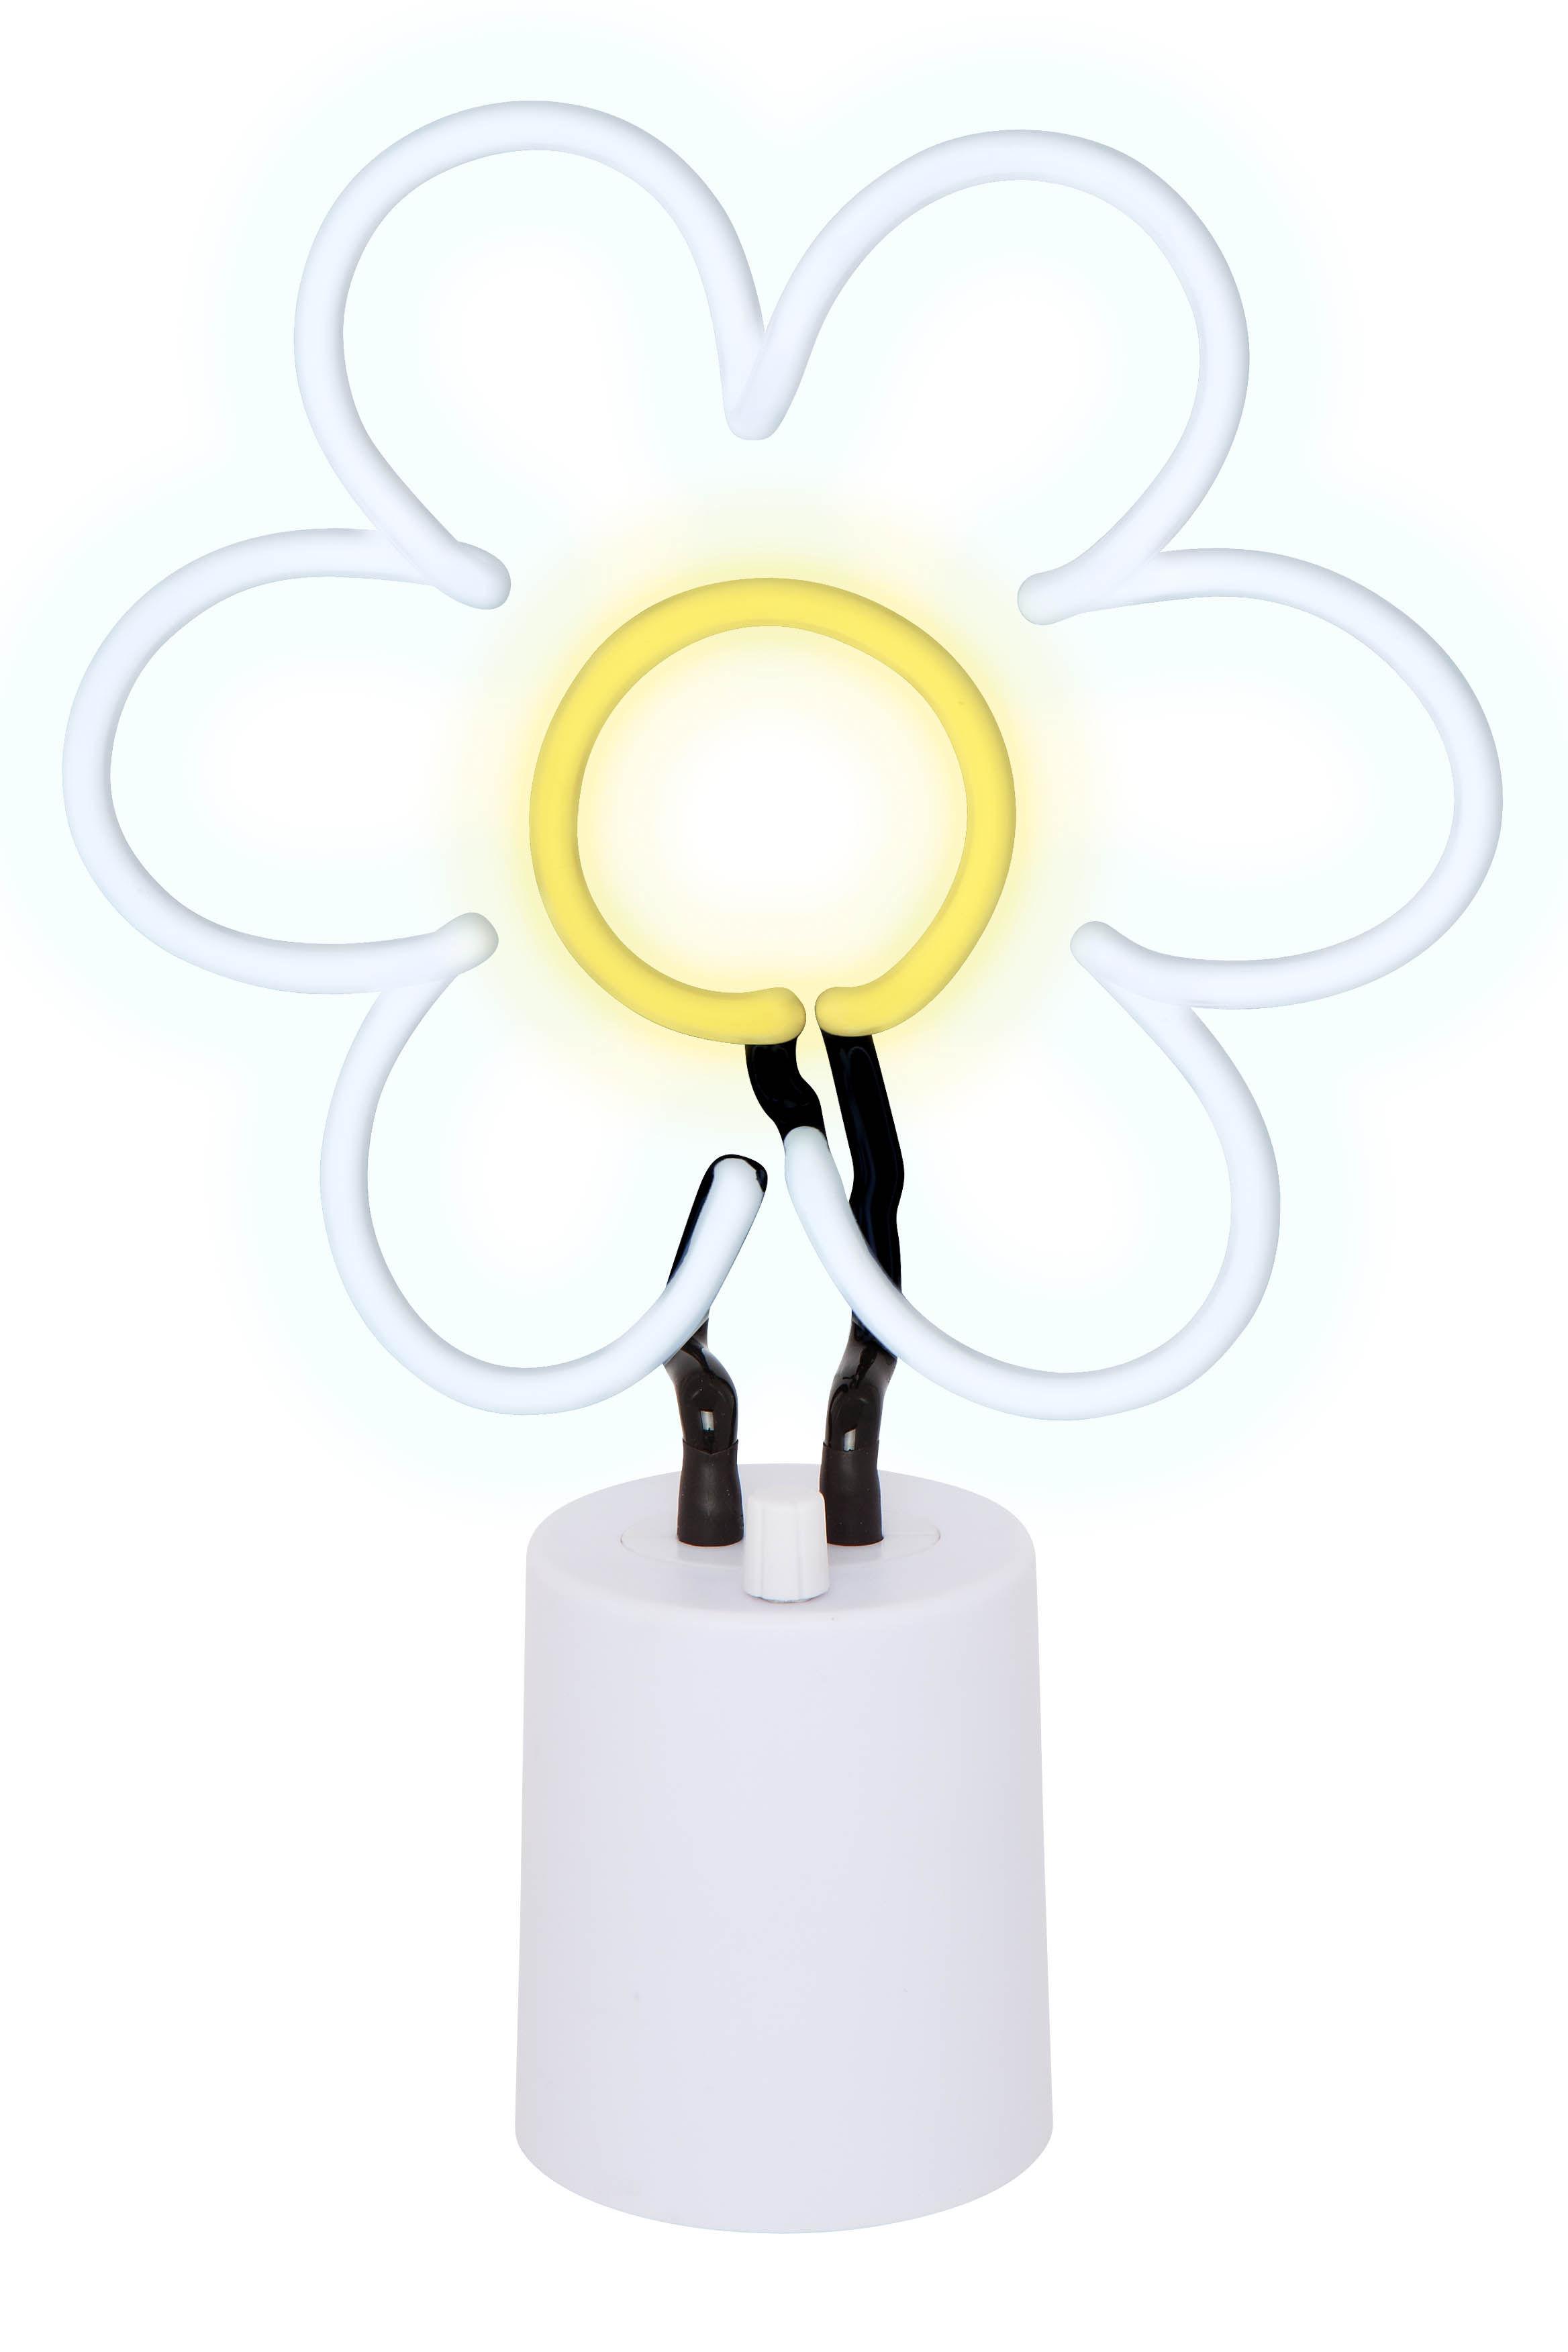 lampe neon marguerite large h 45 cm marguerite jaune blanc sunnylife made in design. Black Bedroom Furniture Sets. Home Design Ideas